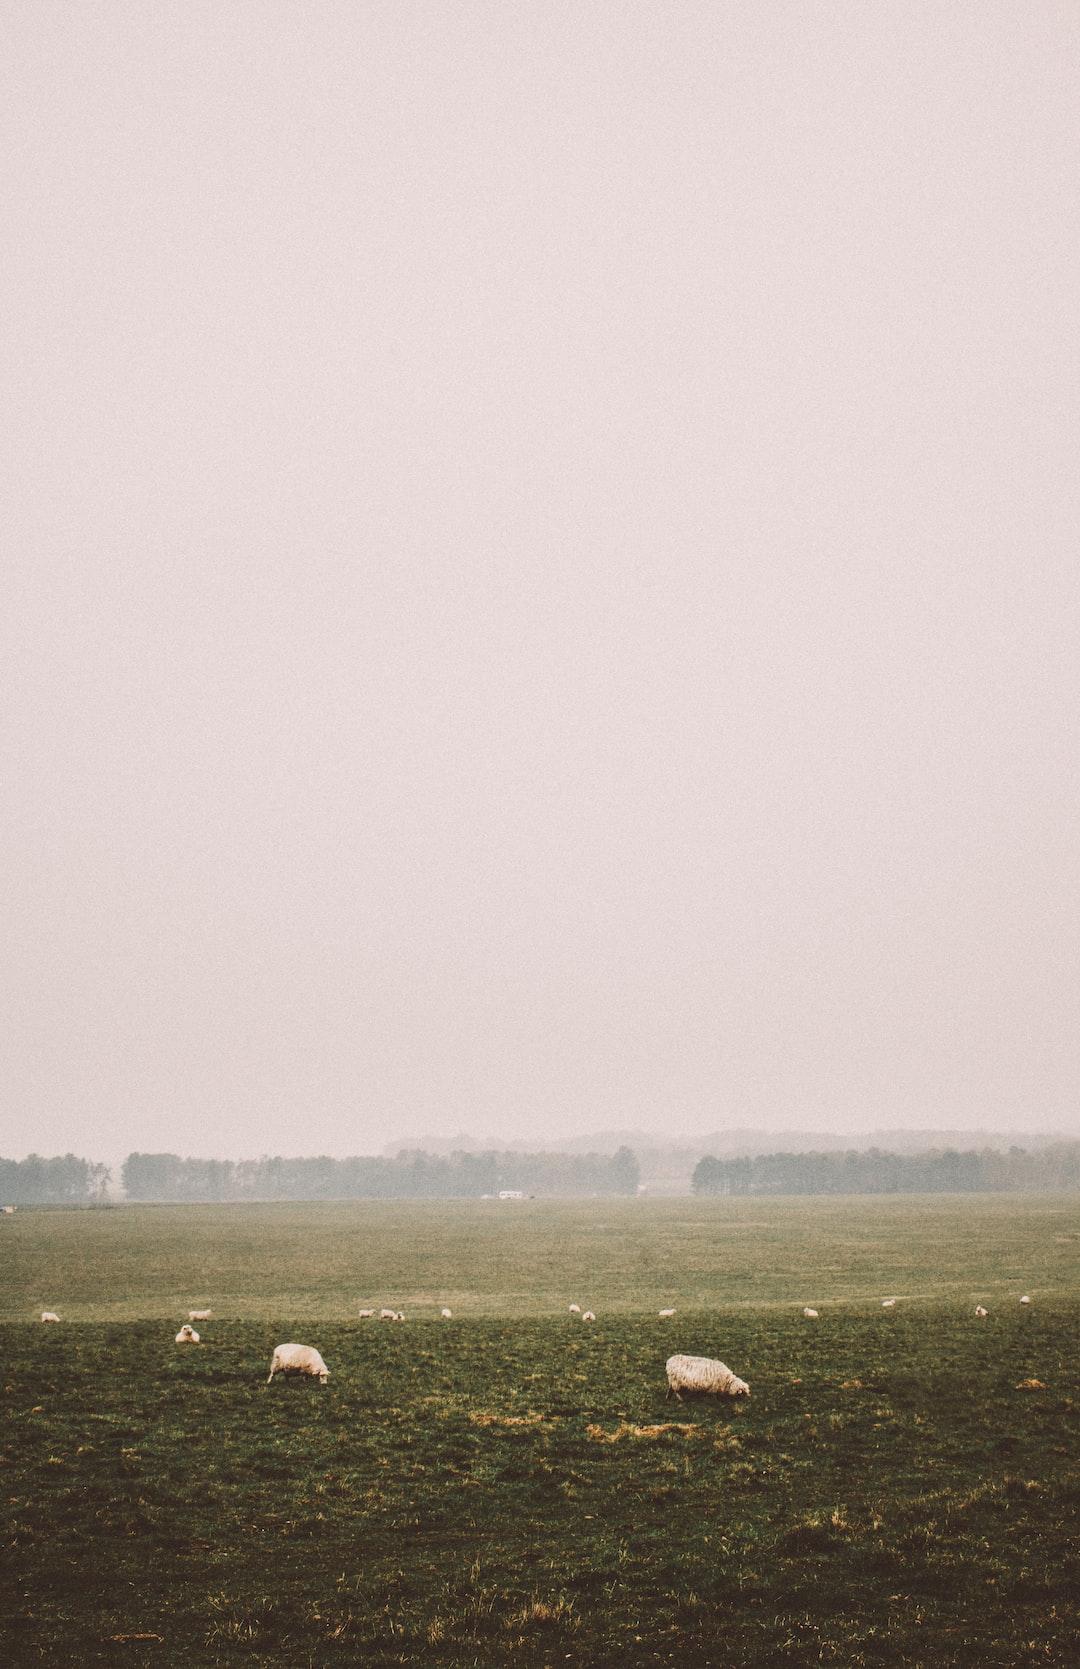 green open field on foggy <b>season</b> photo – Free Nature Image on ...